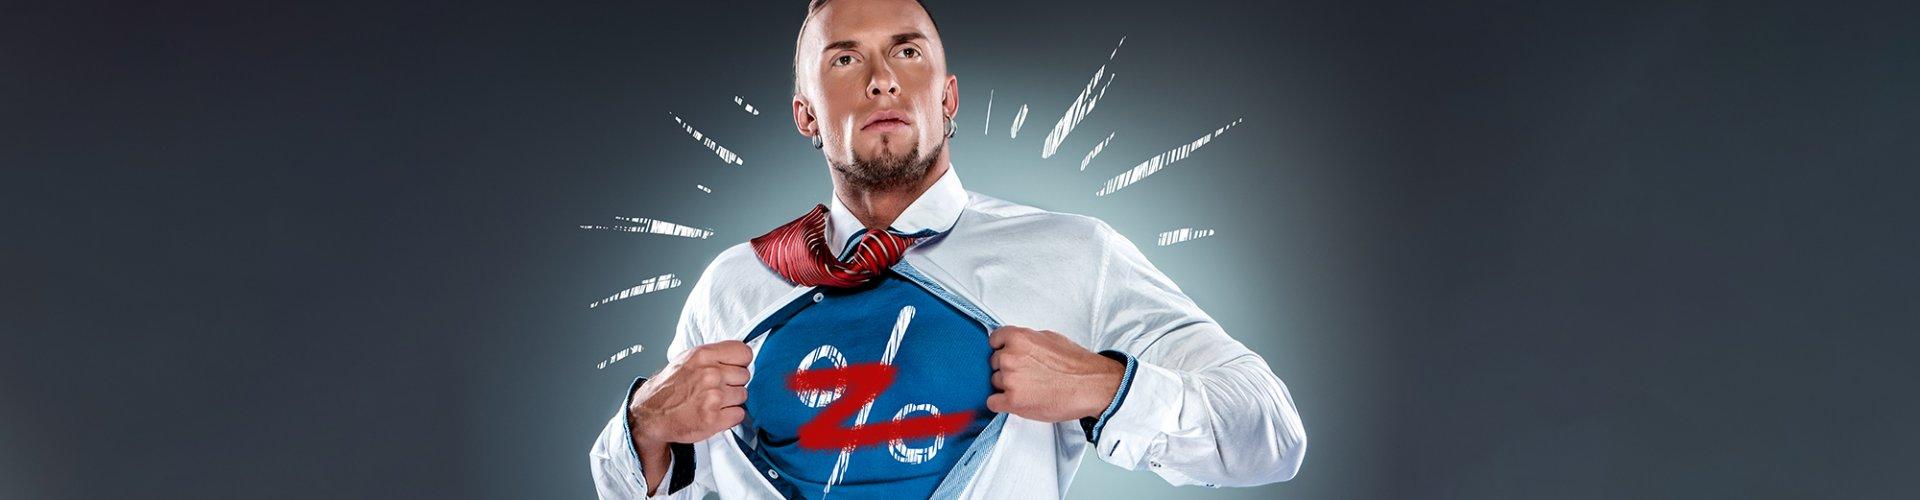 240 дней без процентов, супермен